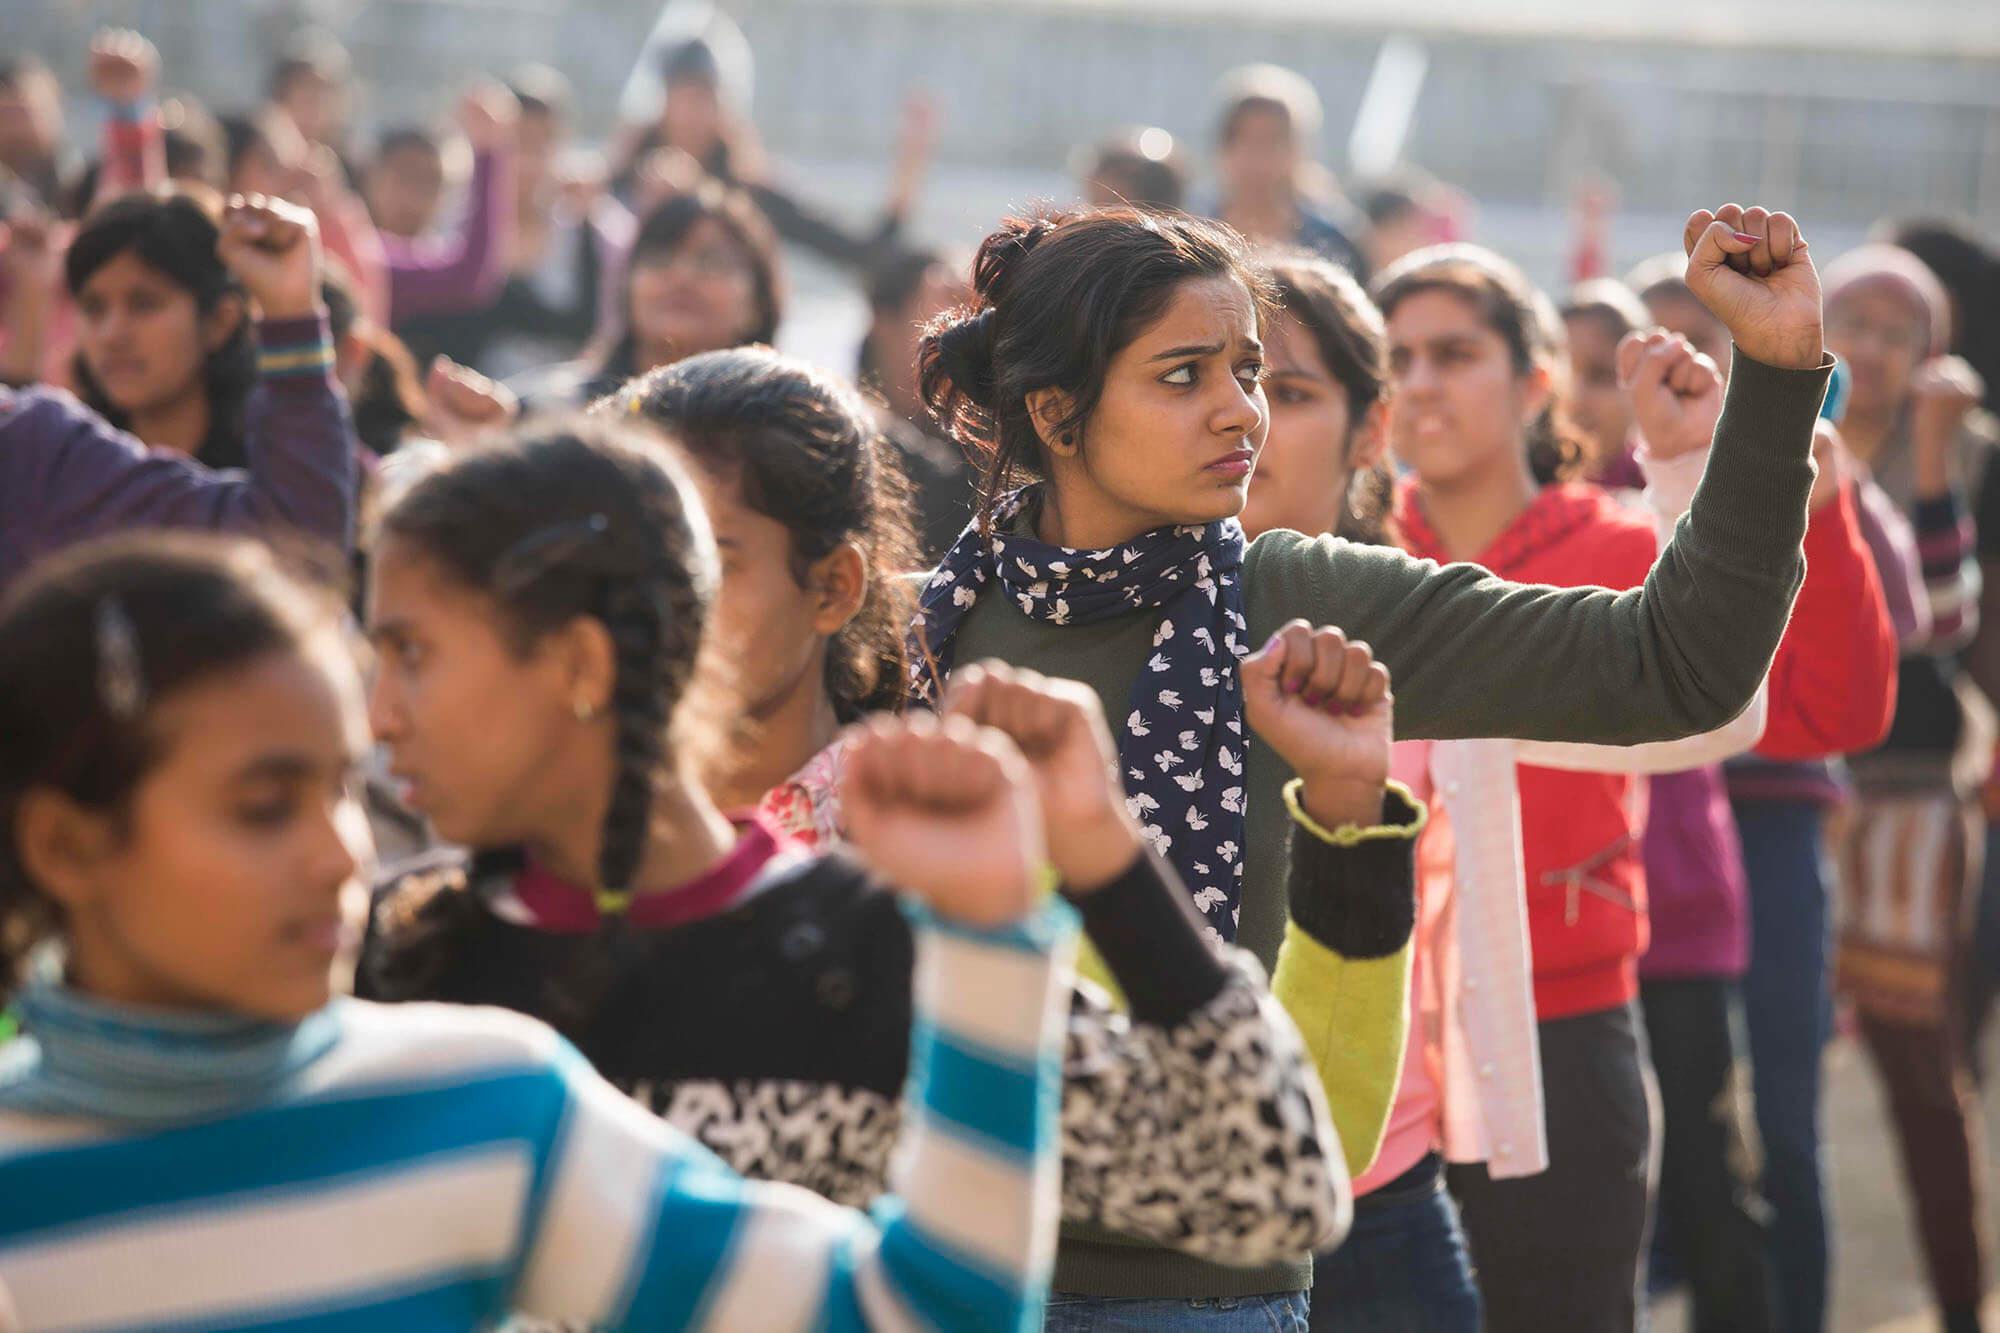 ग्लोबल जेंडर गैप रिपोर्ट 2021: 28 पायदान गिरकर 140वें पायदान पर पहुंचा भारत